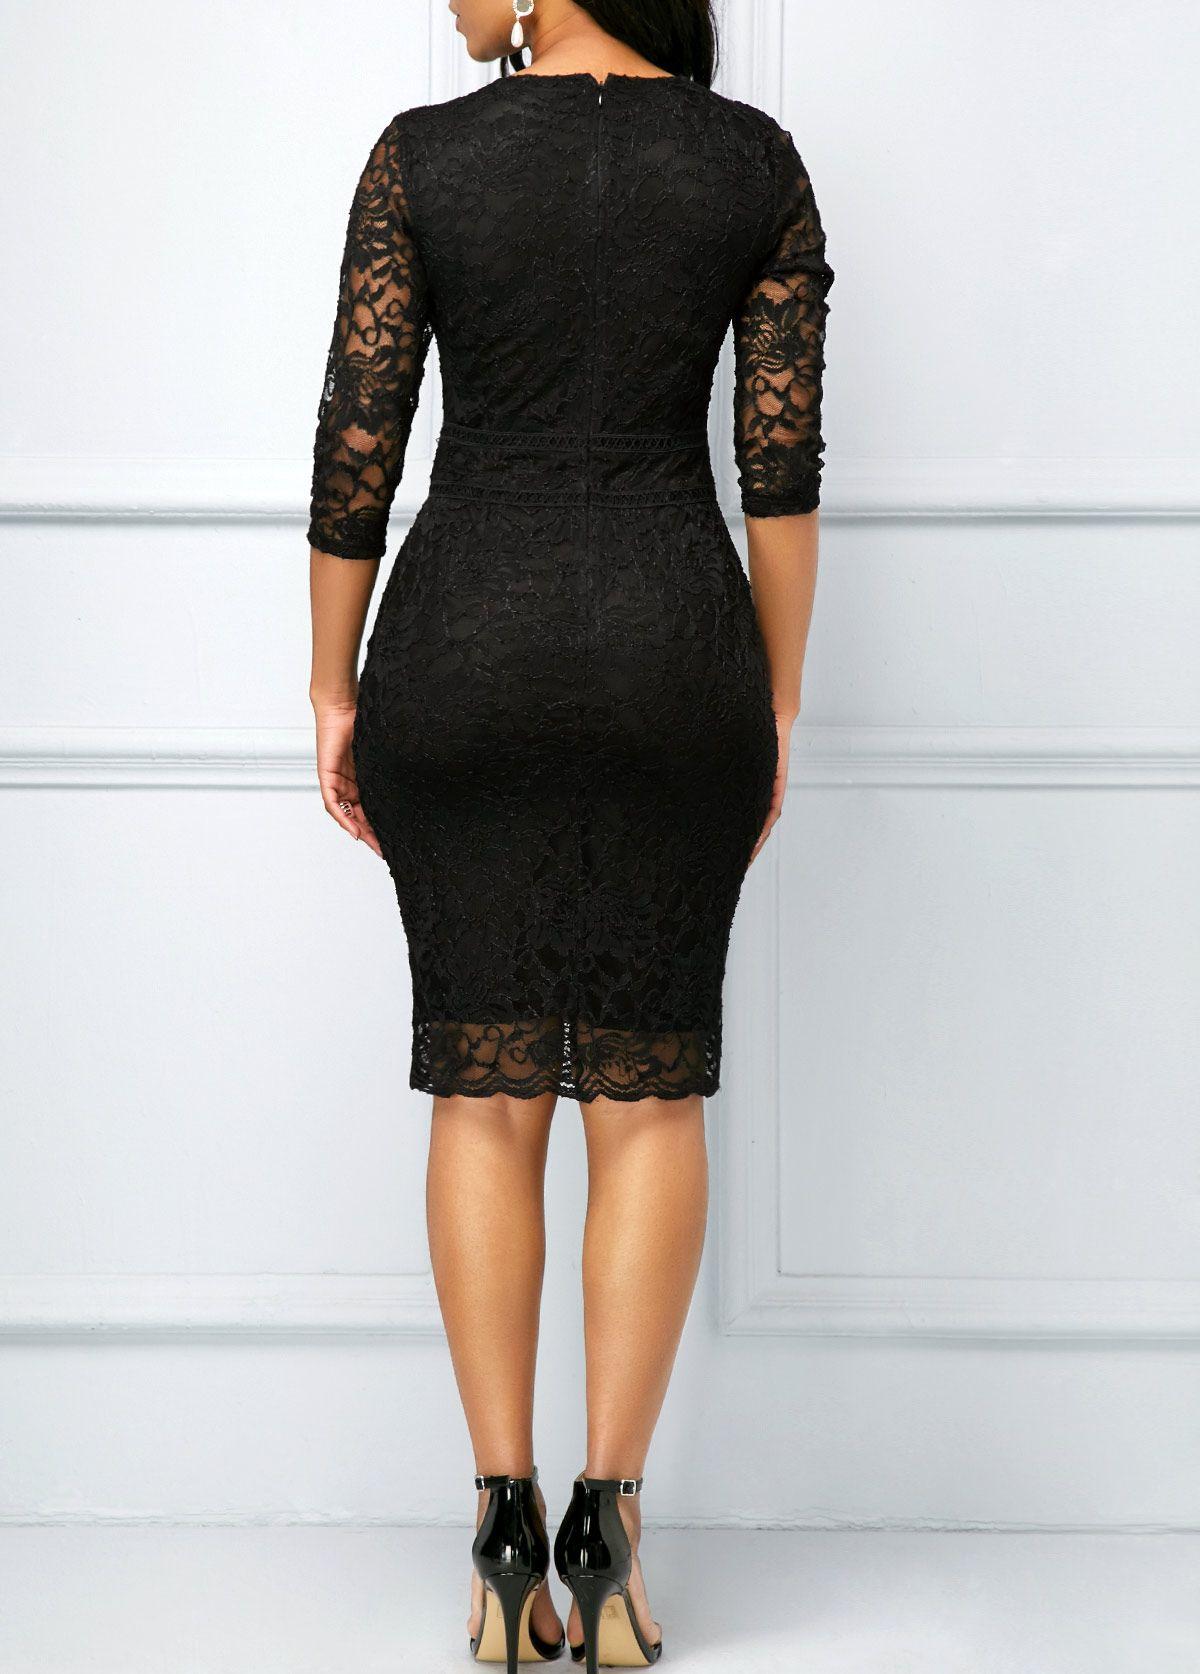 V neck black lace dress  V Neck Black Three Quarter Sleeve Lace Dress  Pinterest  Quarter